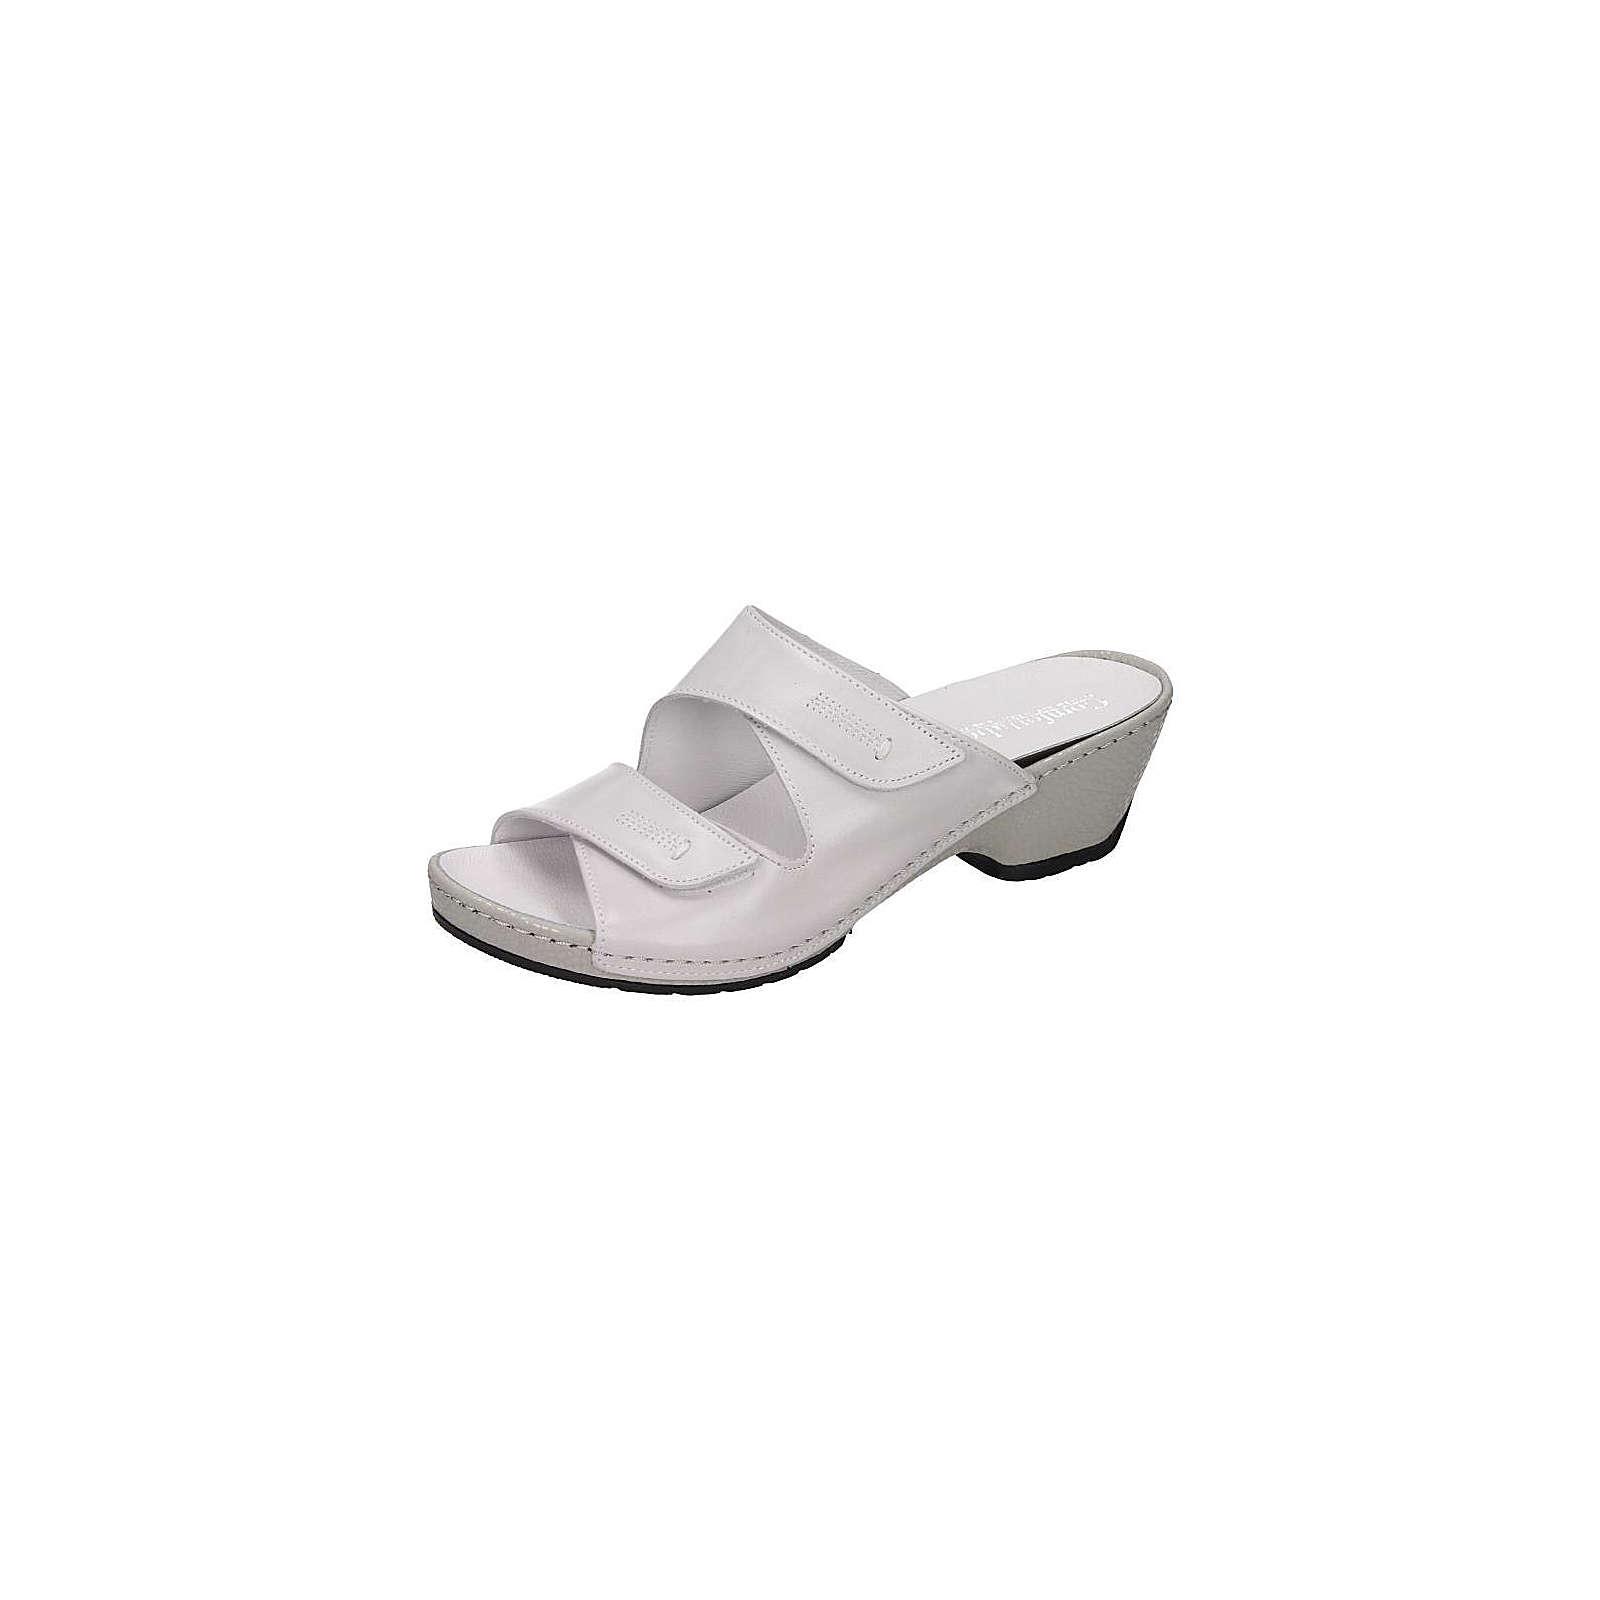 Comfortabel Damen Pantolette Komfort-Pantoletten weiß Damen Gr. 37